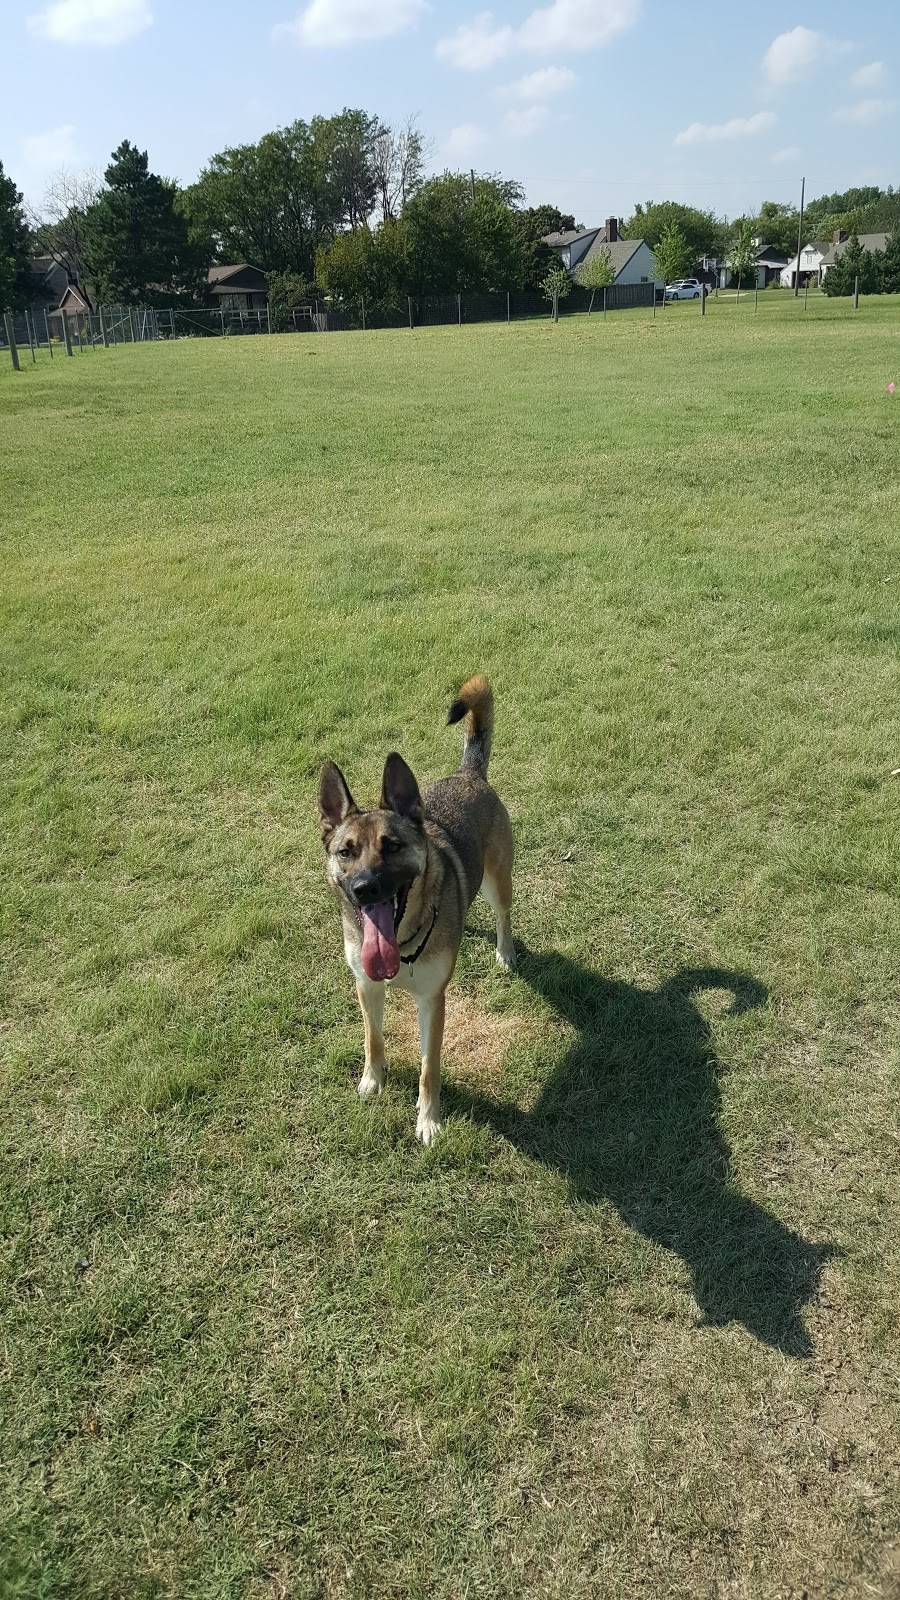 Meridian Dog Park - park    Photo 7 of 9   Address: 2127 N Meridian Ave, Wichita, KS 67203, USA   Phone: (316) 268-4361